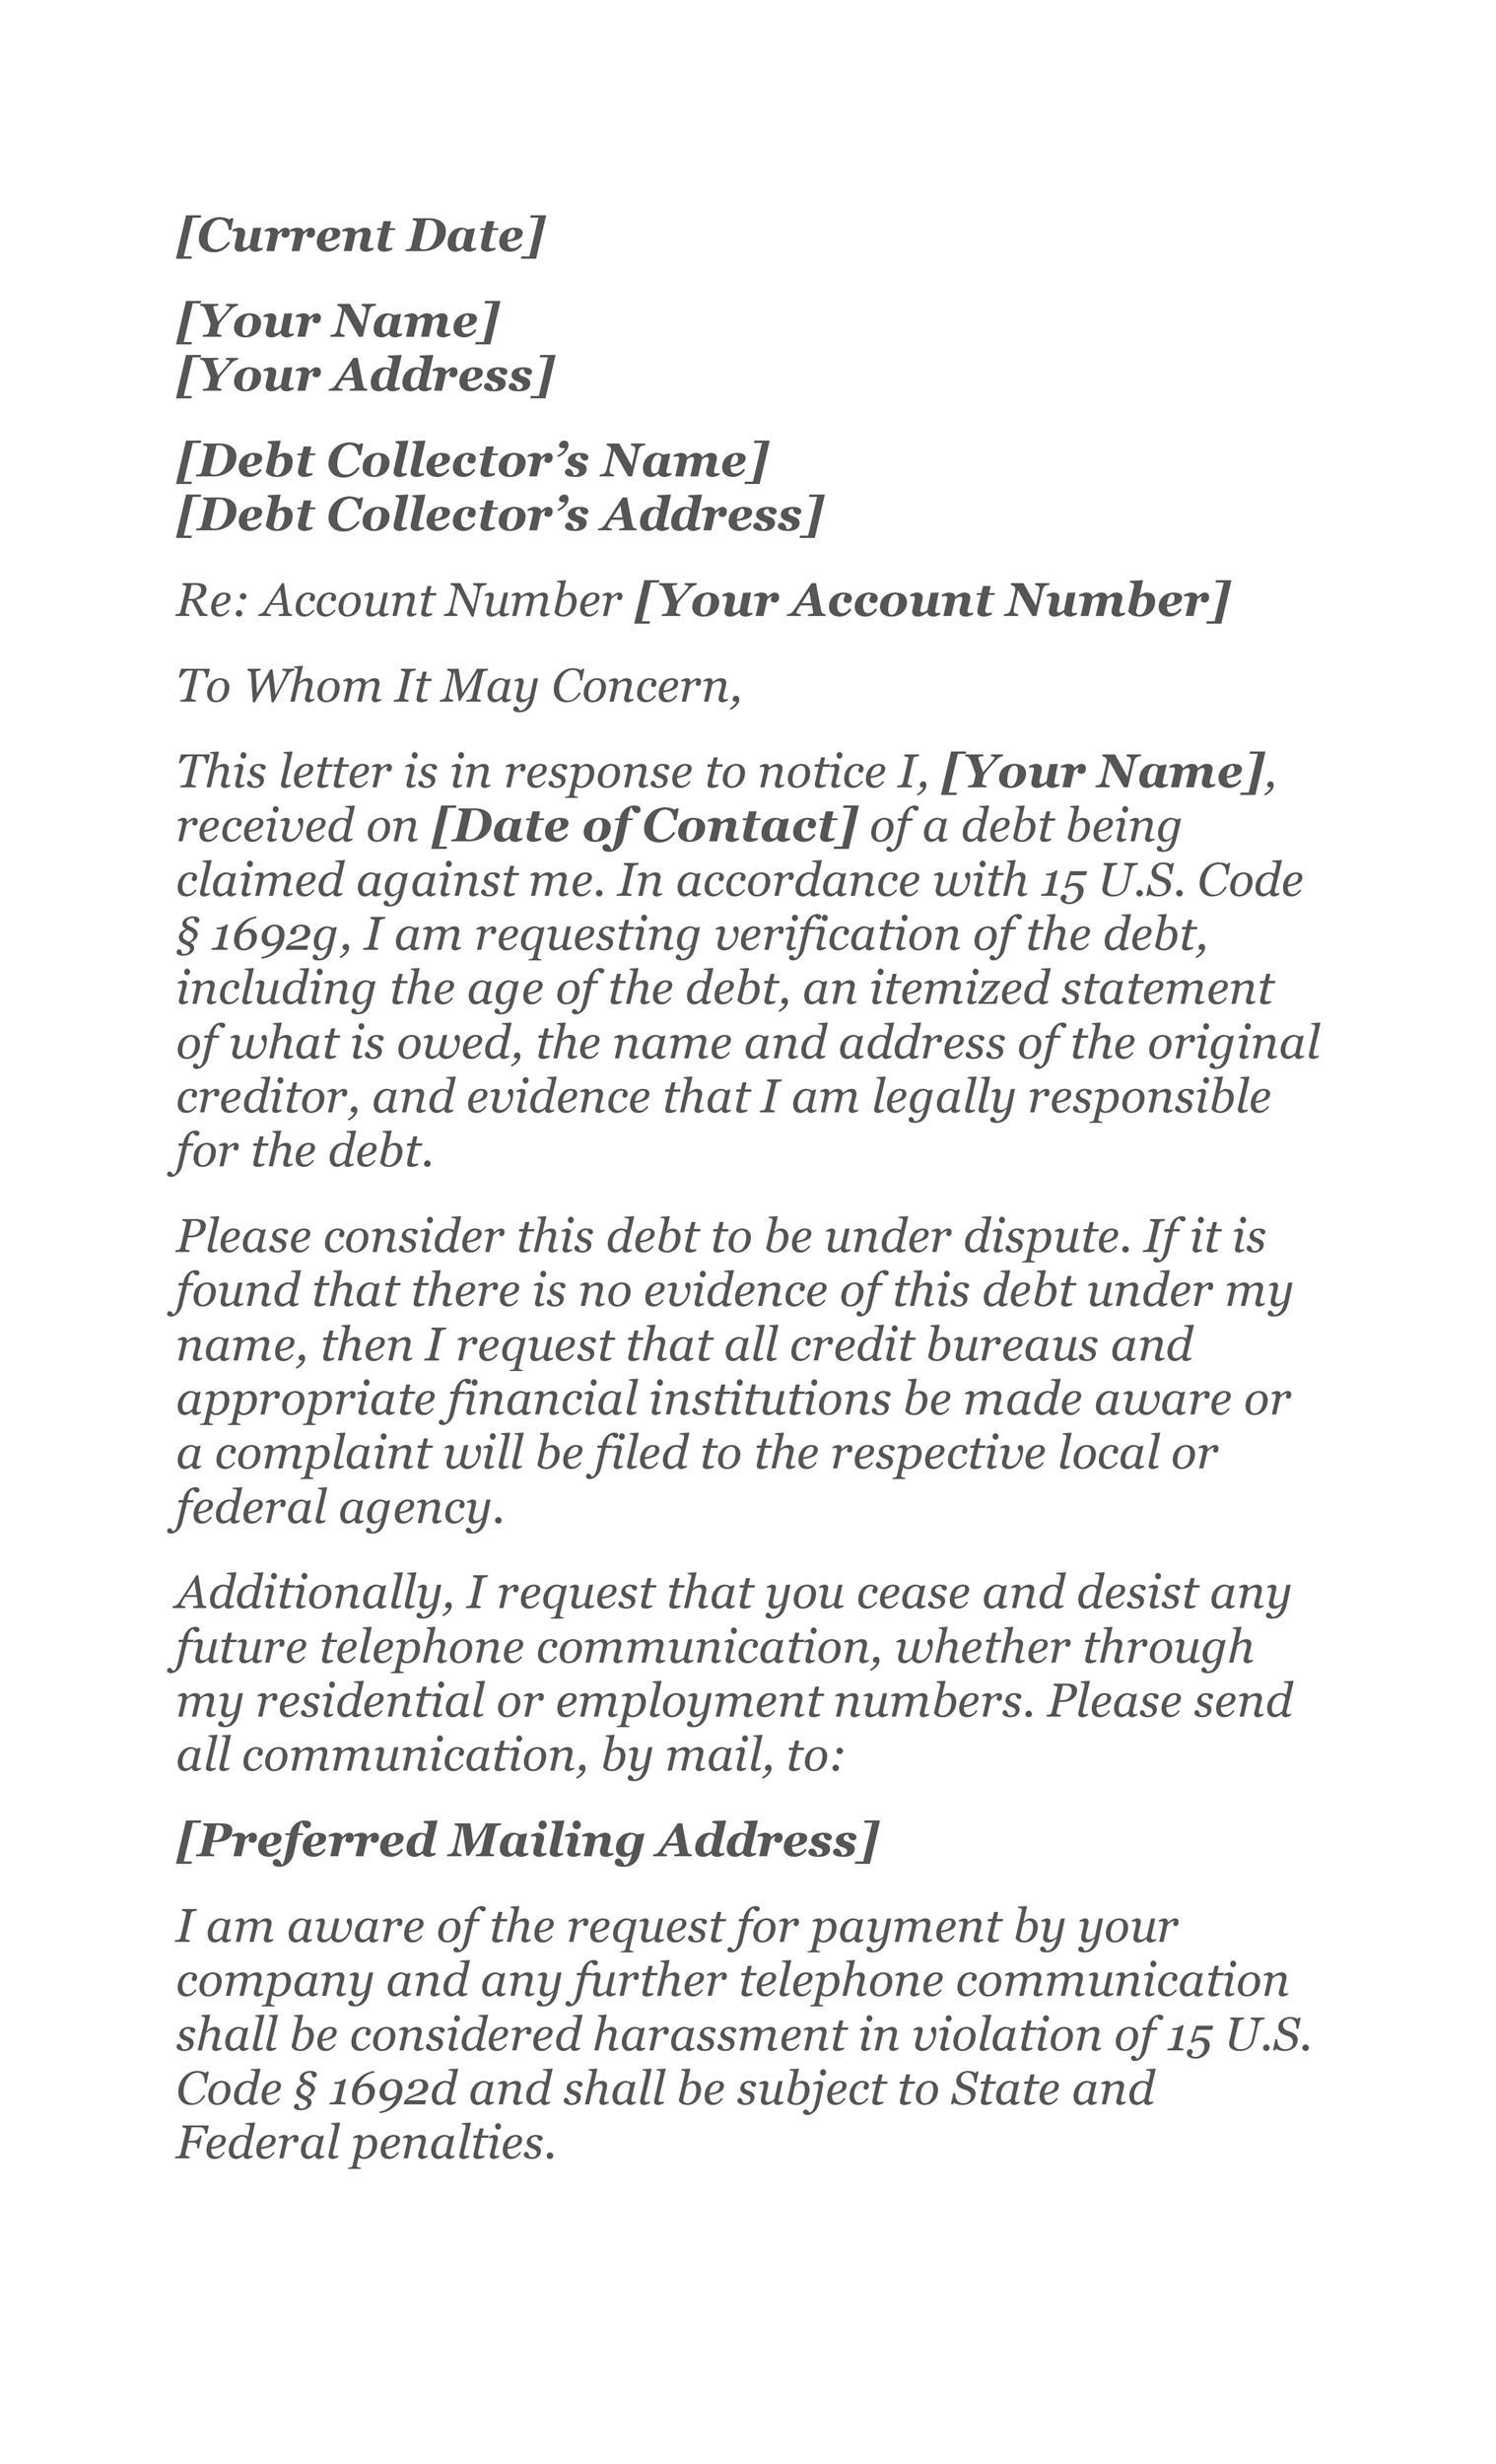 Free debt validation letter 47